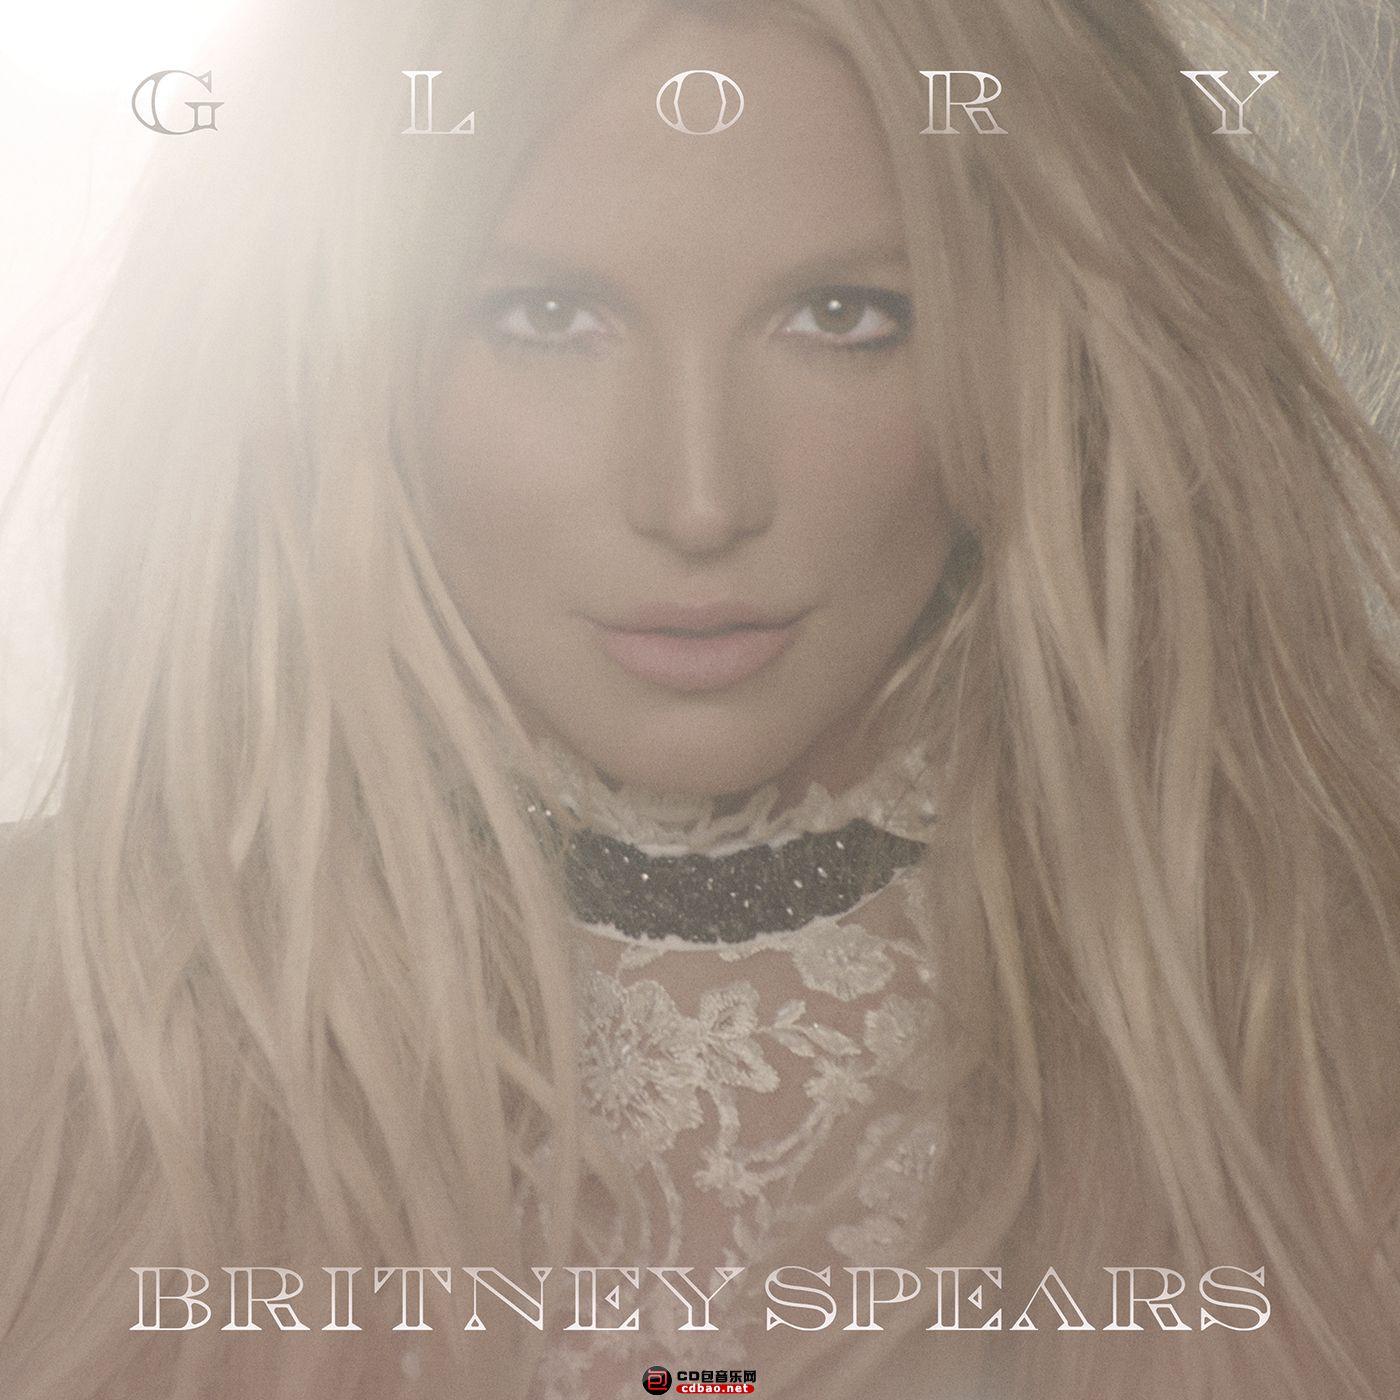 glory-deluxe-version-britney-spears.jpg